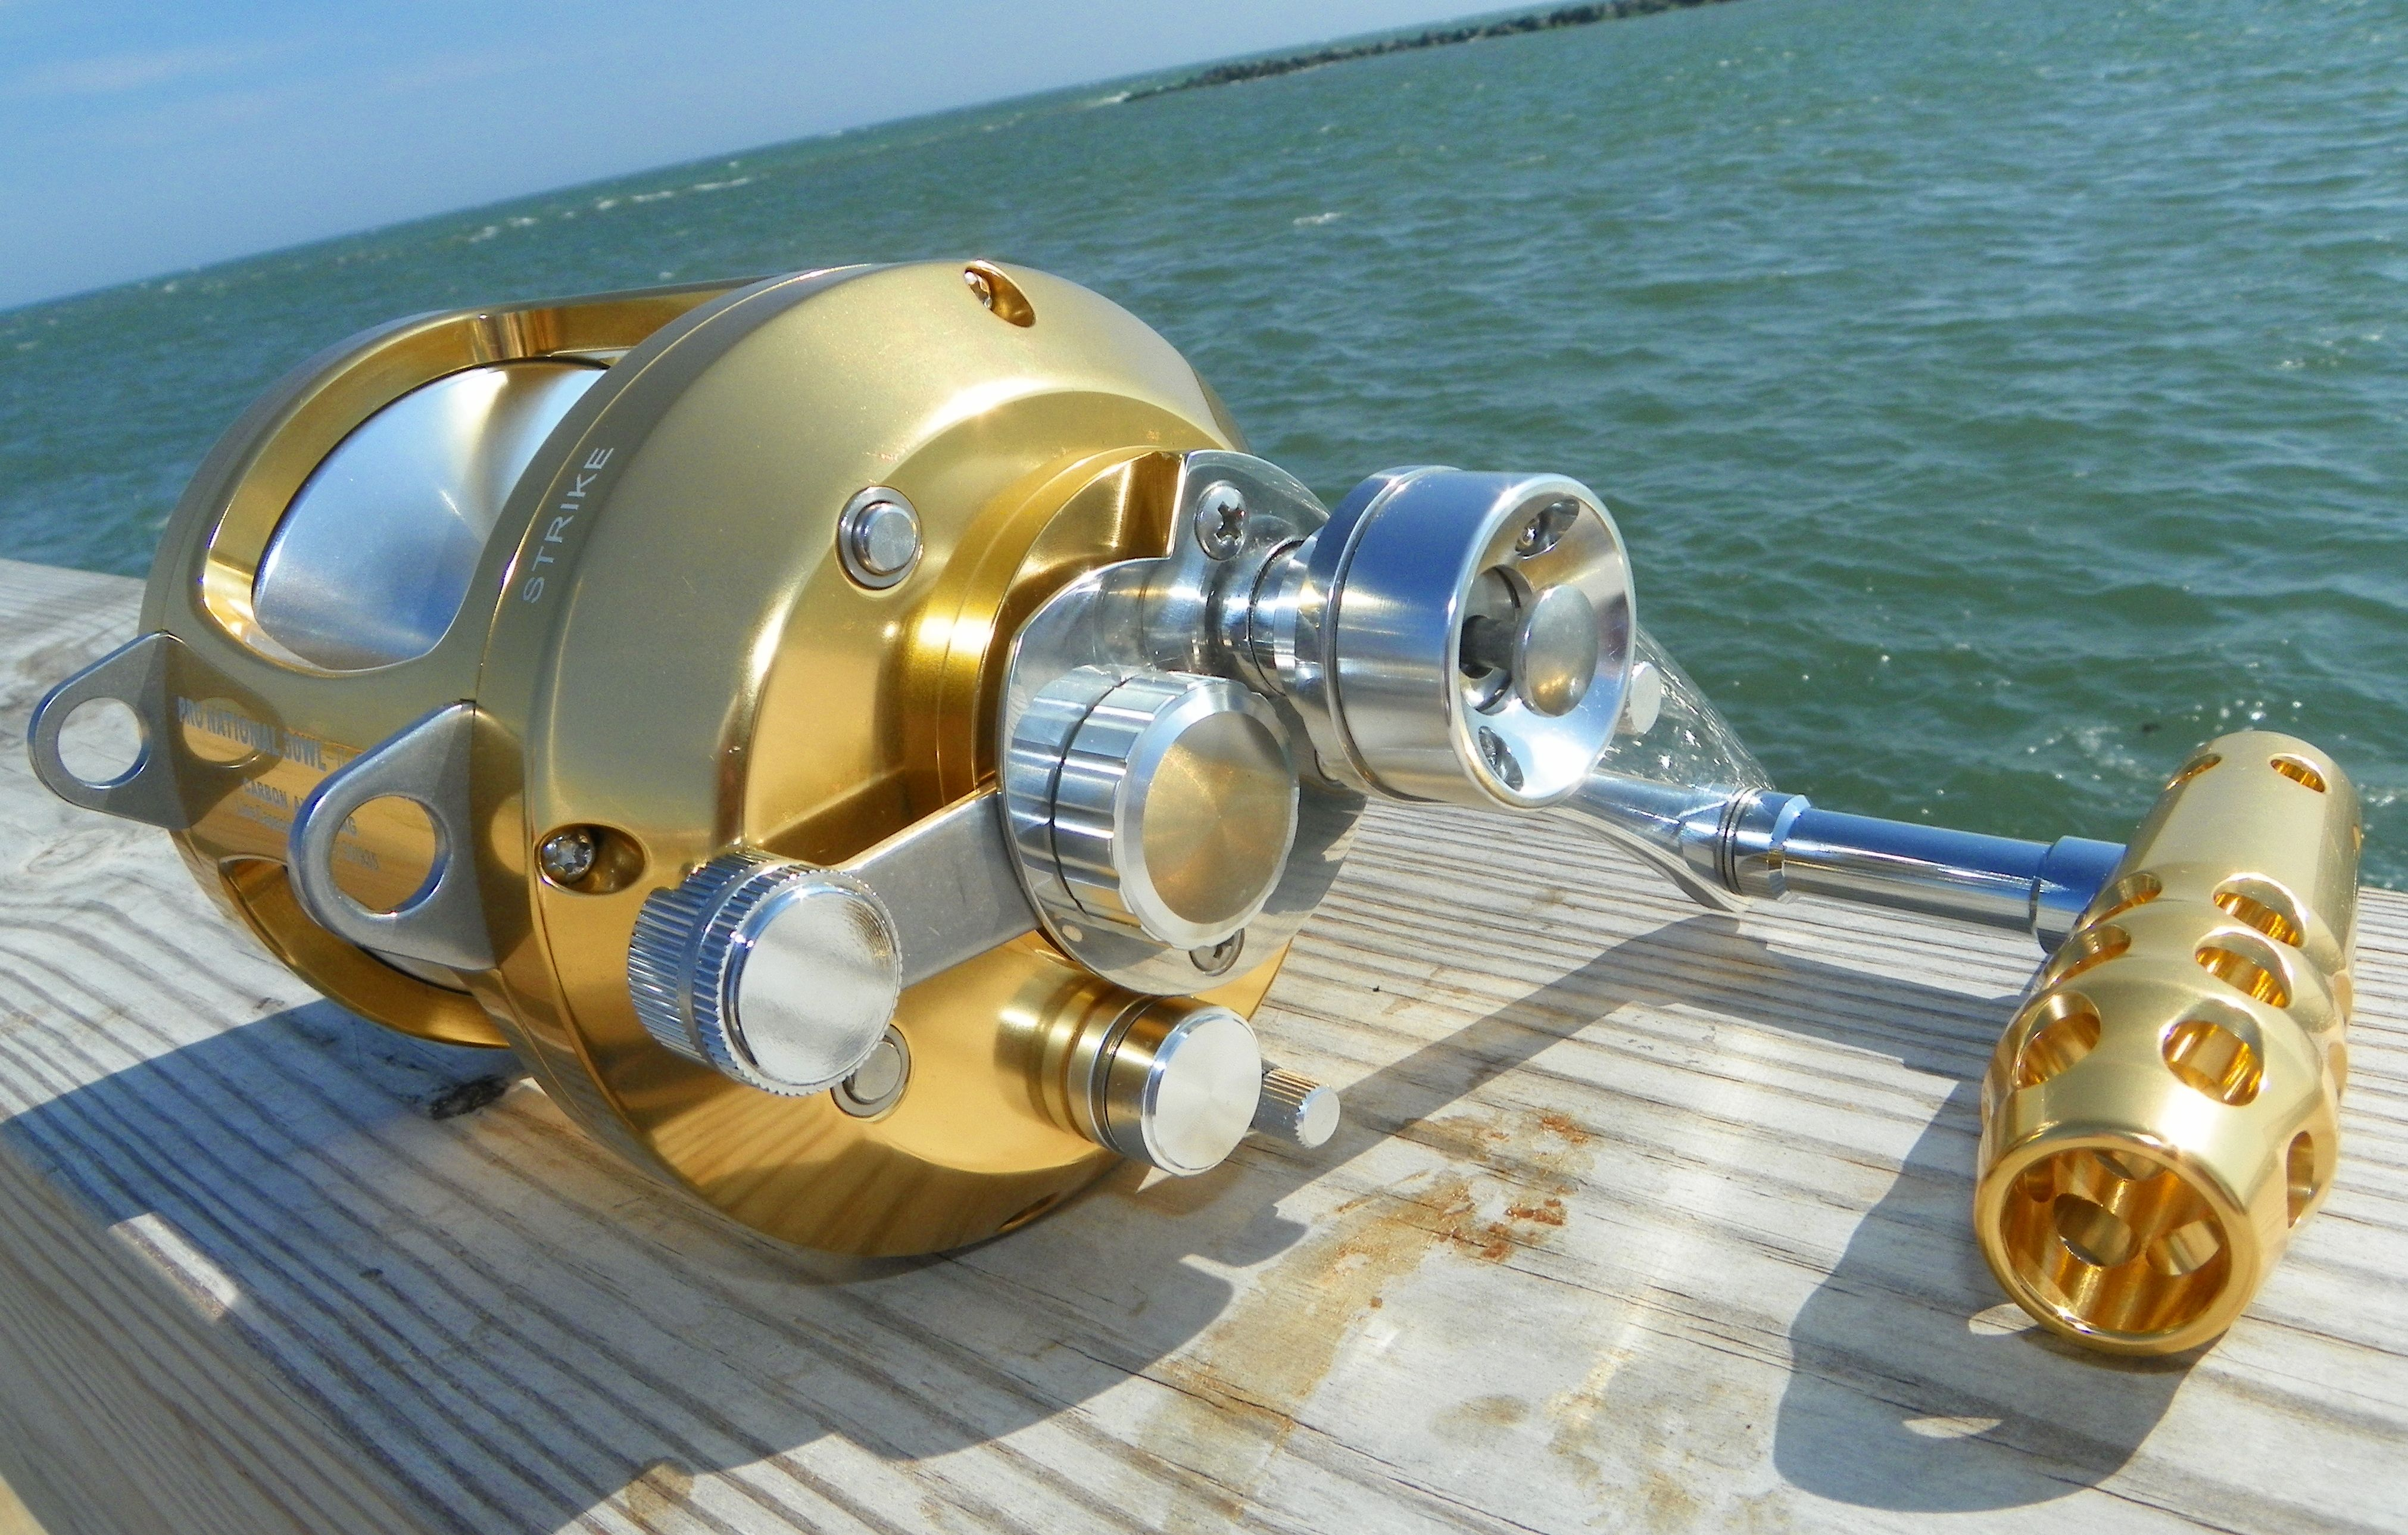 Okiaya pro national 50w ii 2 speed saltwater reel for Tuna fishing reels